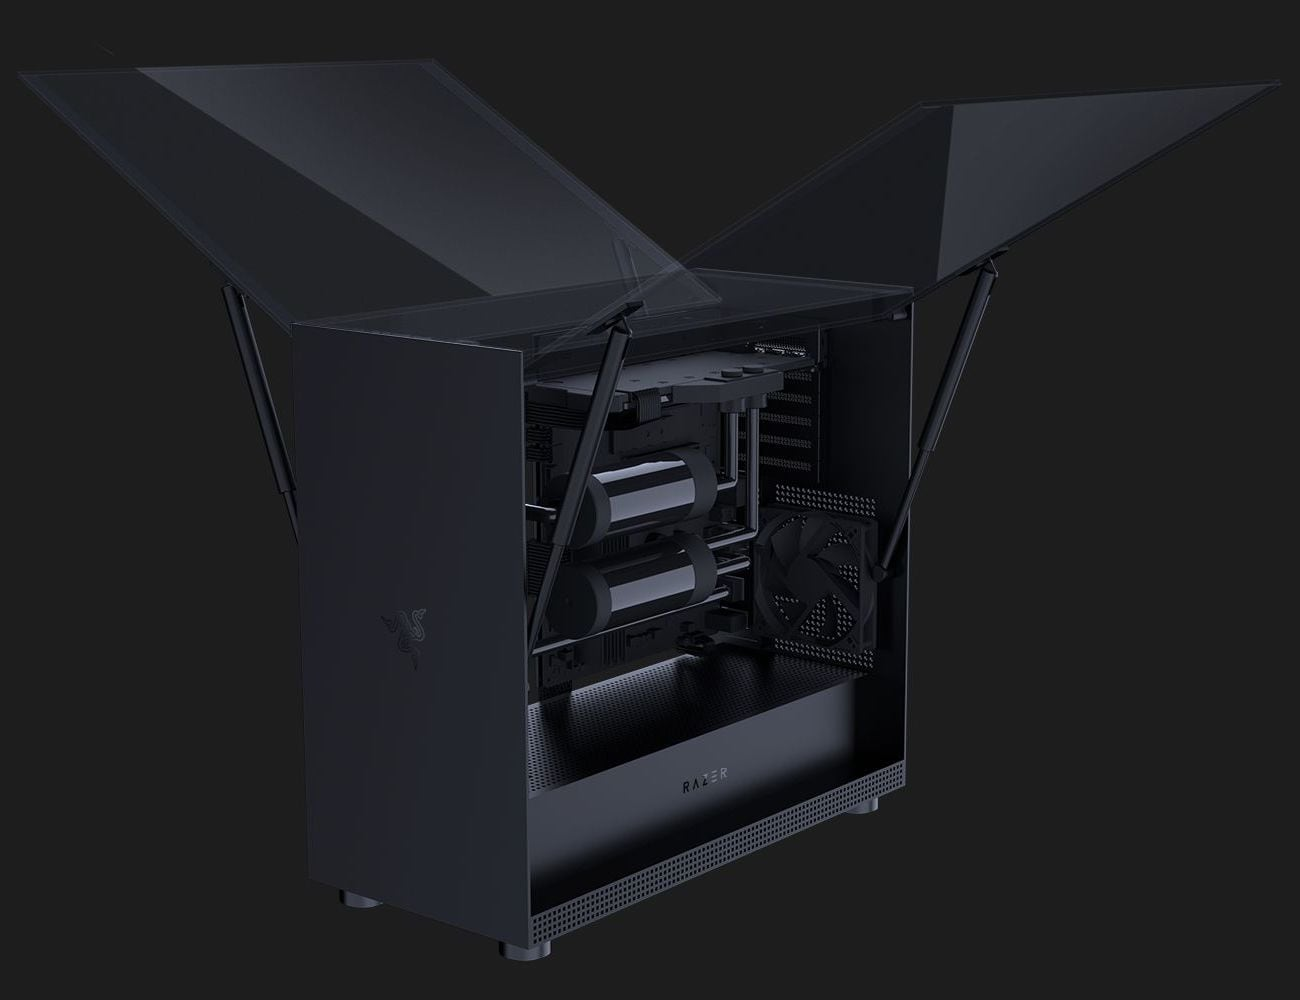 Razer Tomahawk Elite Advanced PC Case houses your prized components